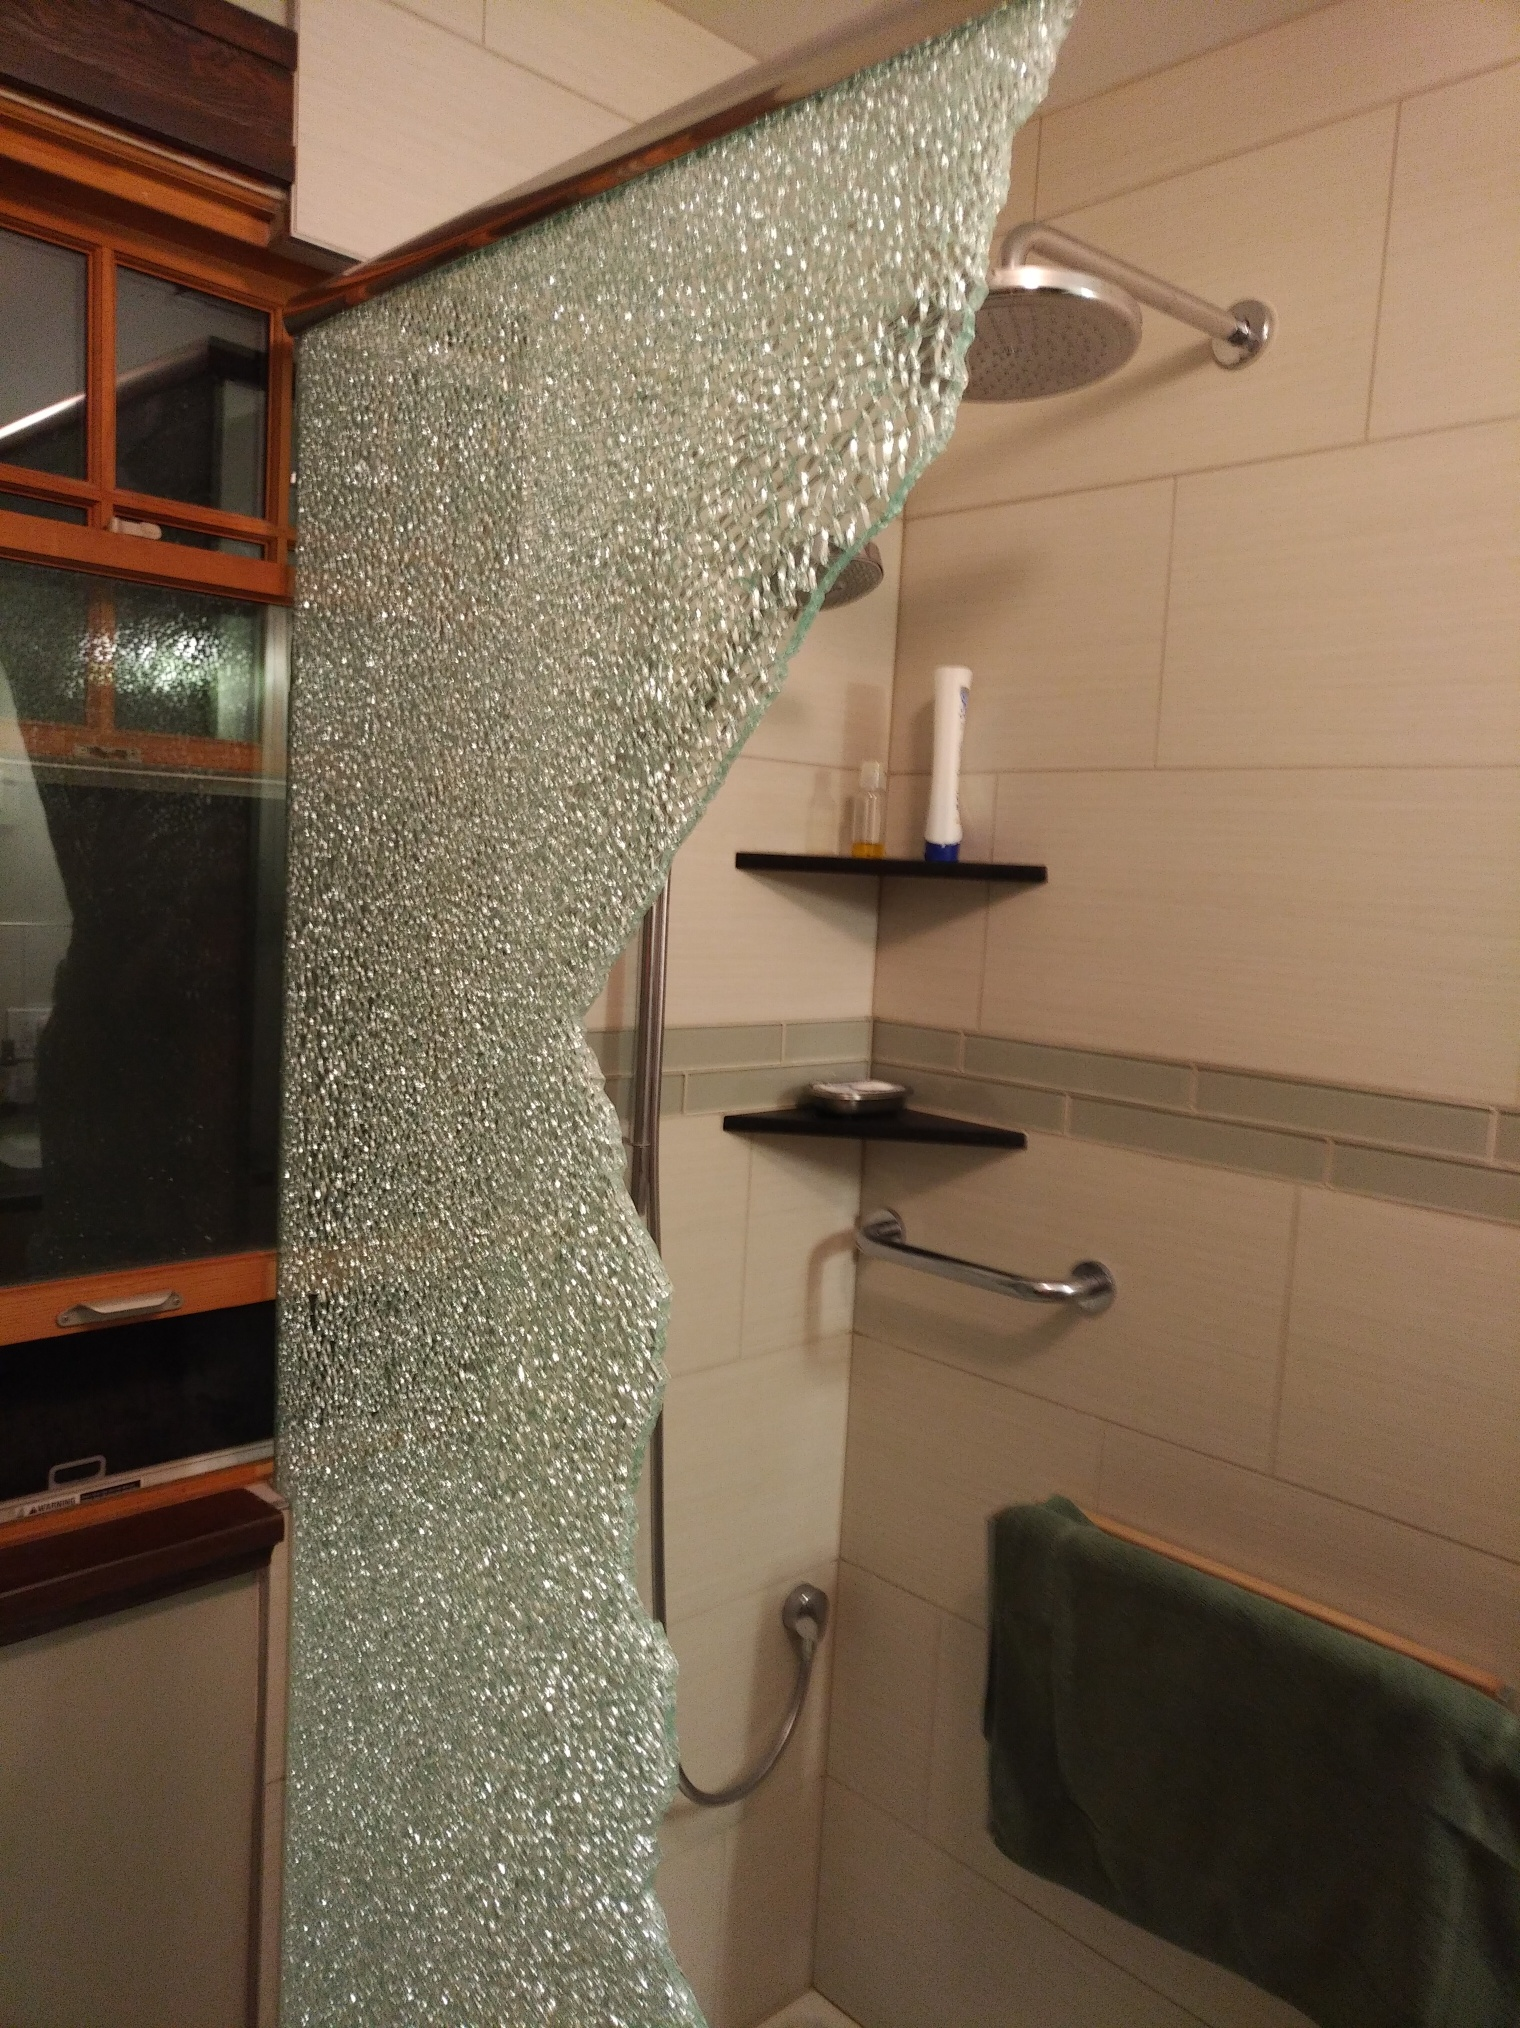 shower glass1.jpg